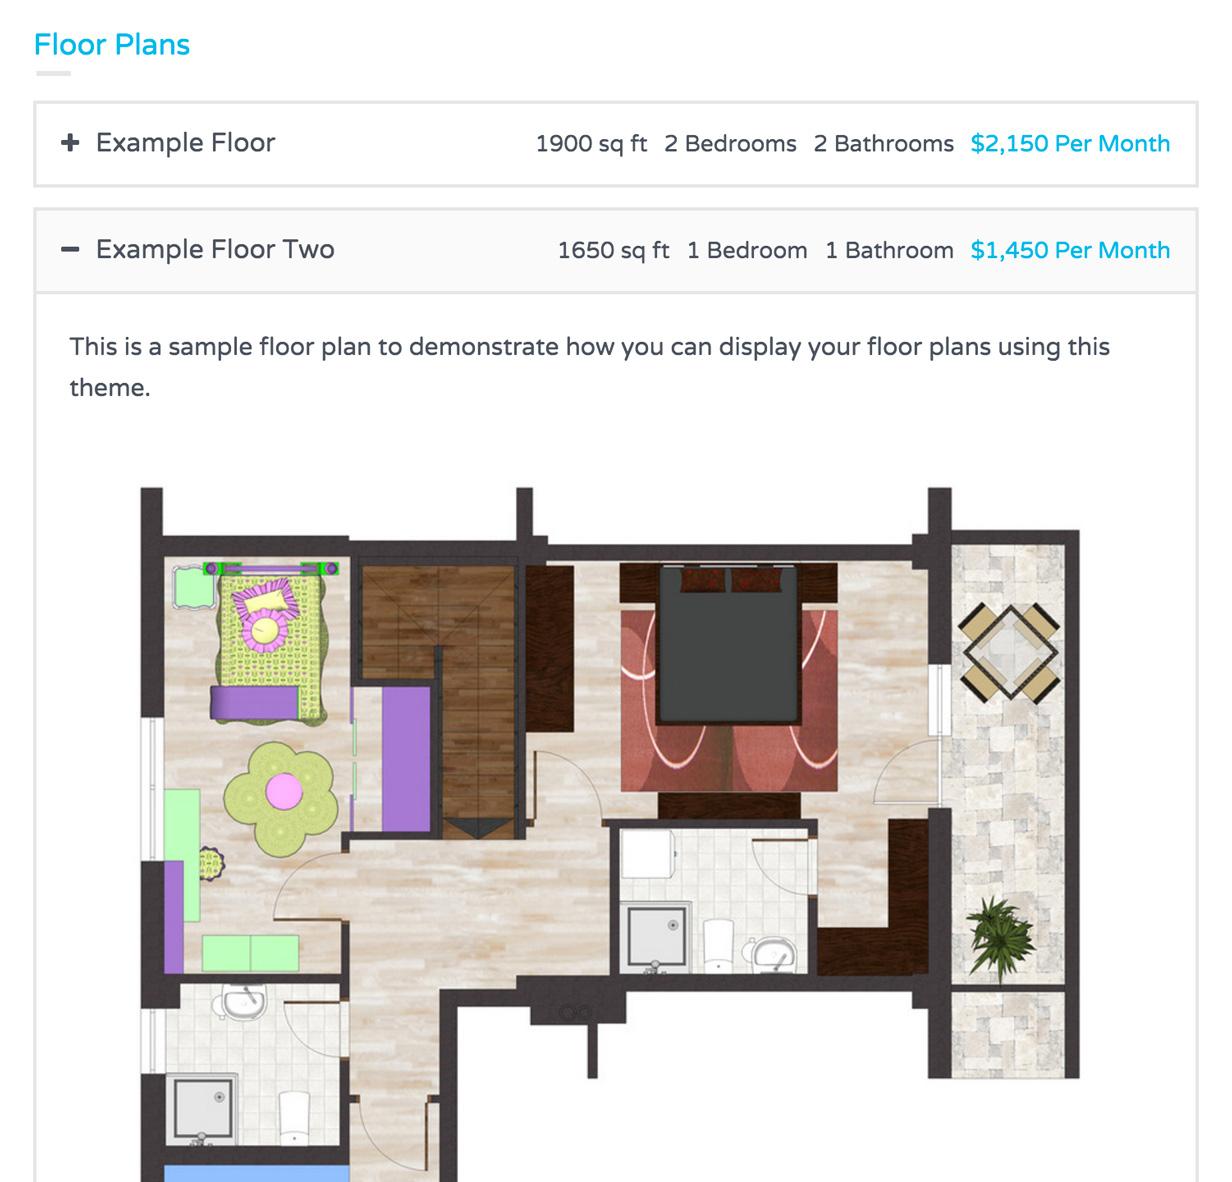 rp 09 - RealPlaces - Estate Sale and Rental WordPress Theme